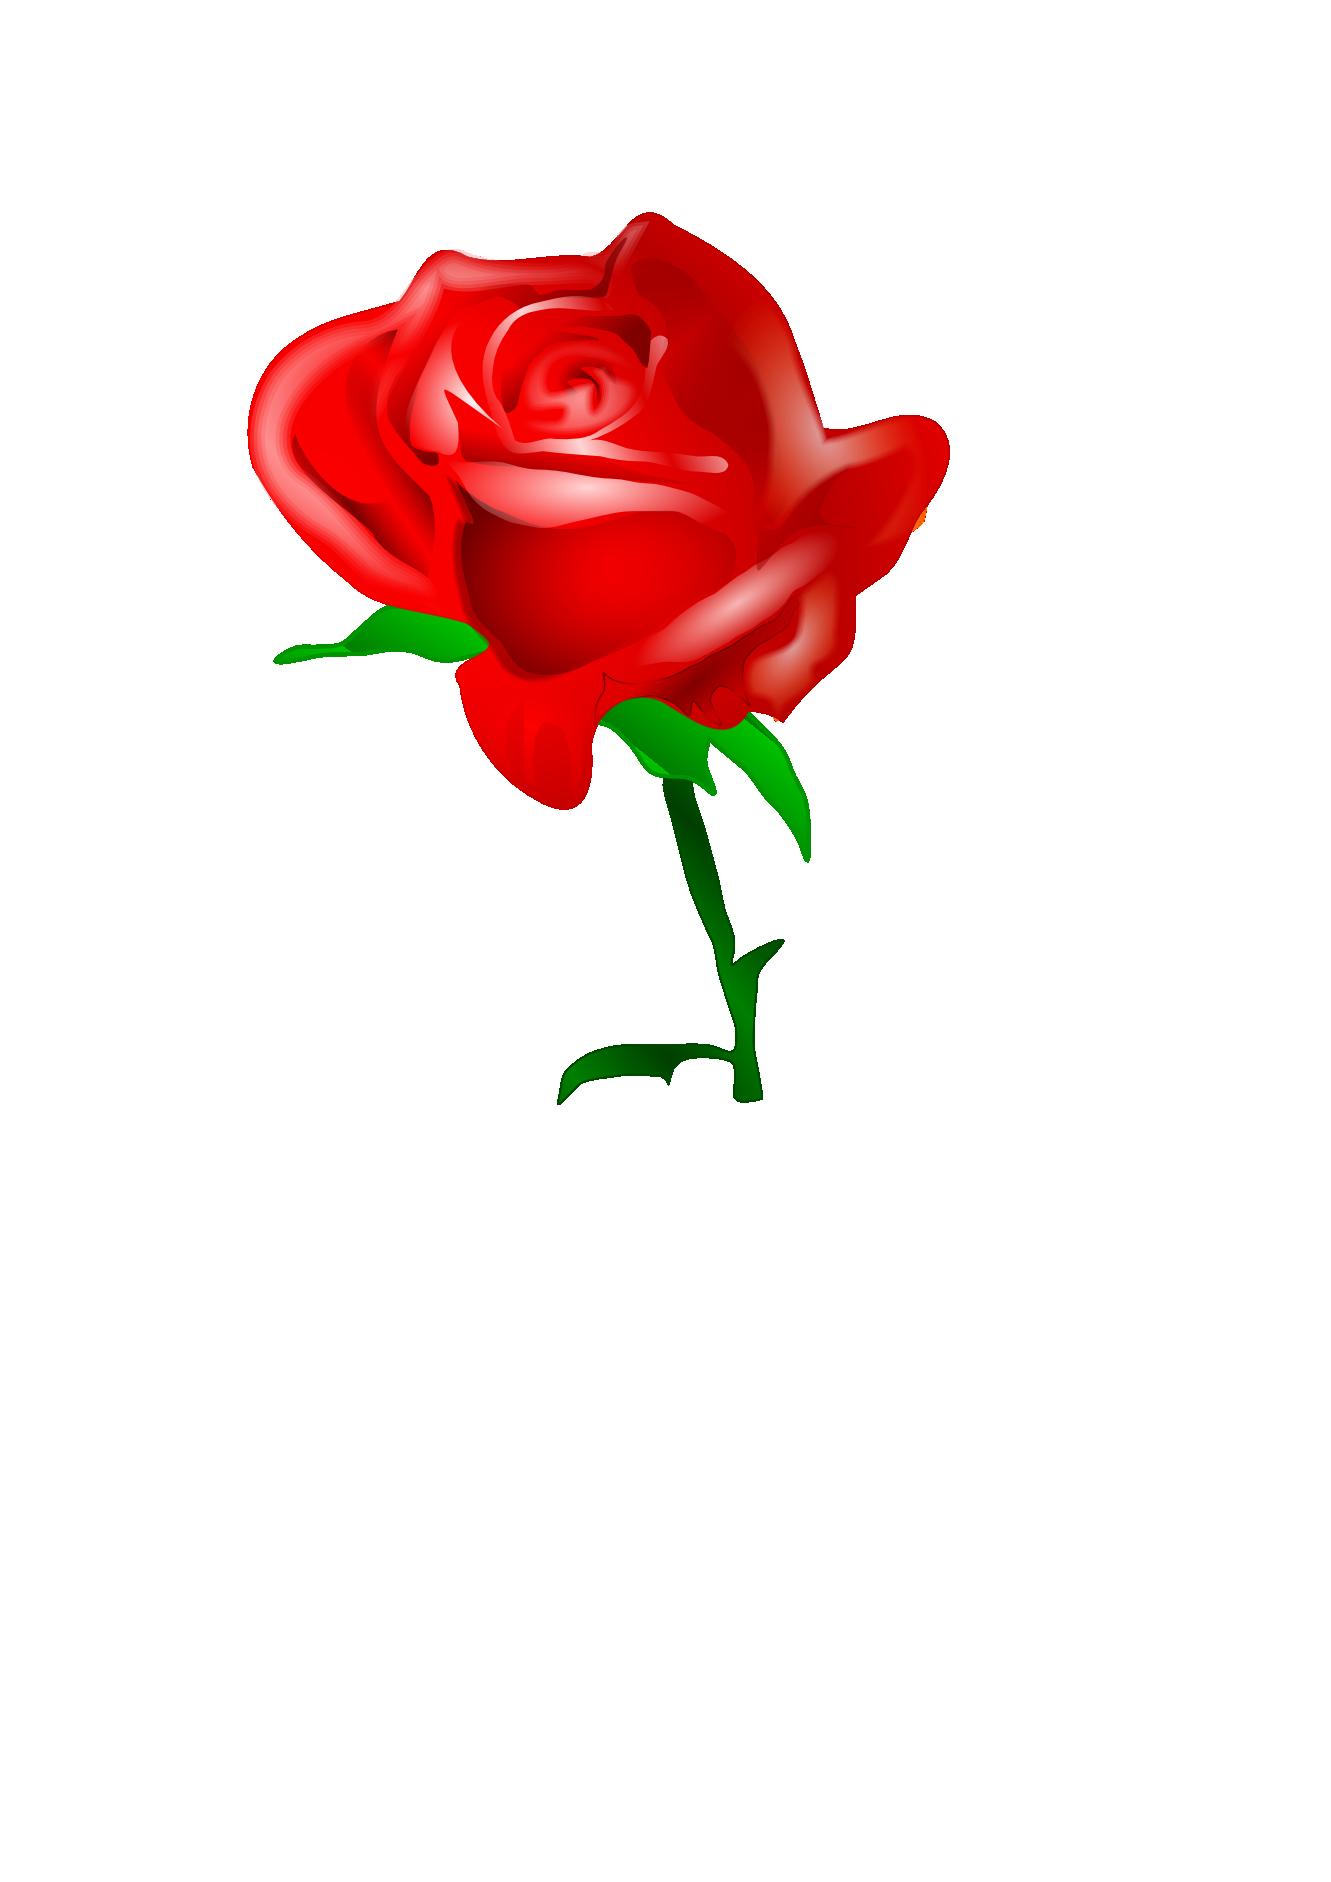 Gardener clipart family. Rose garden at getdrawings